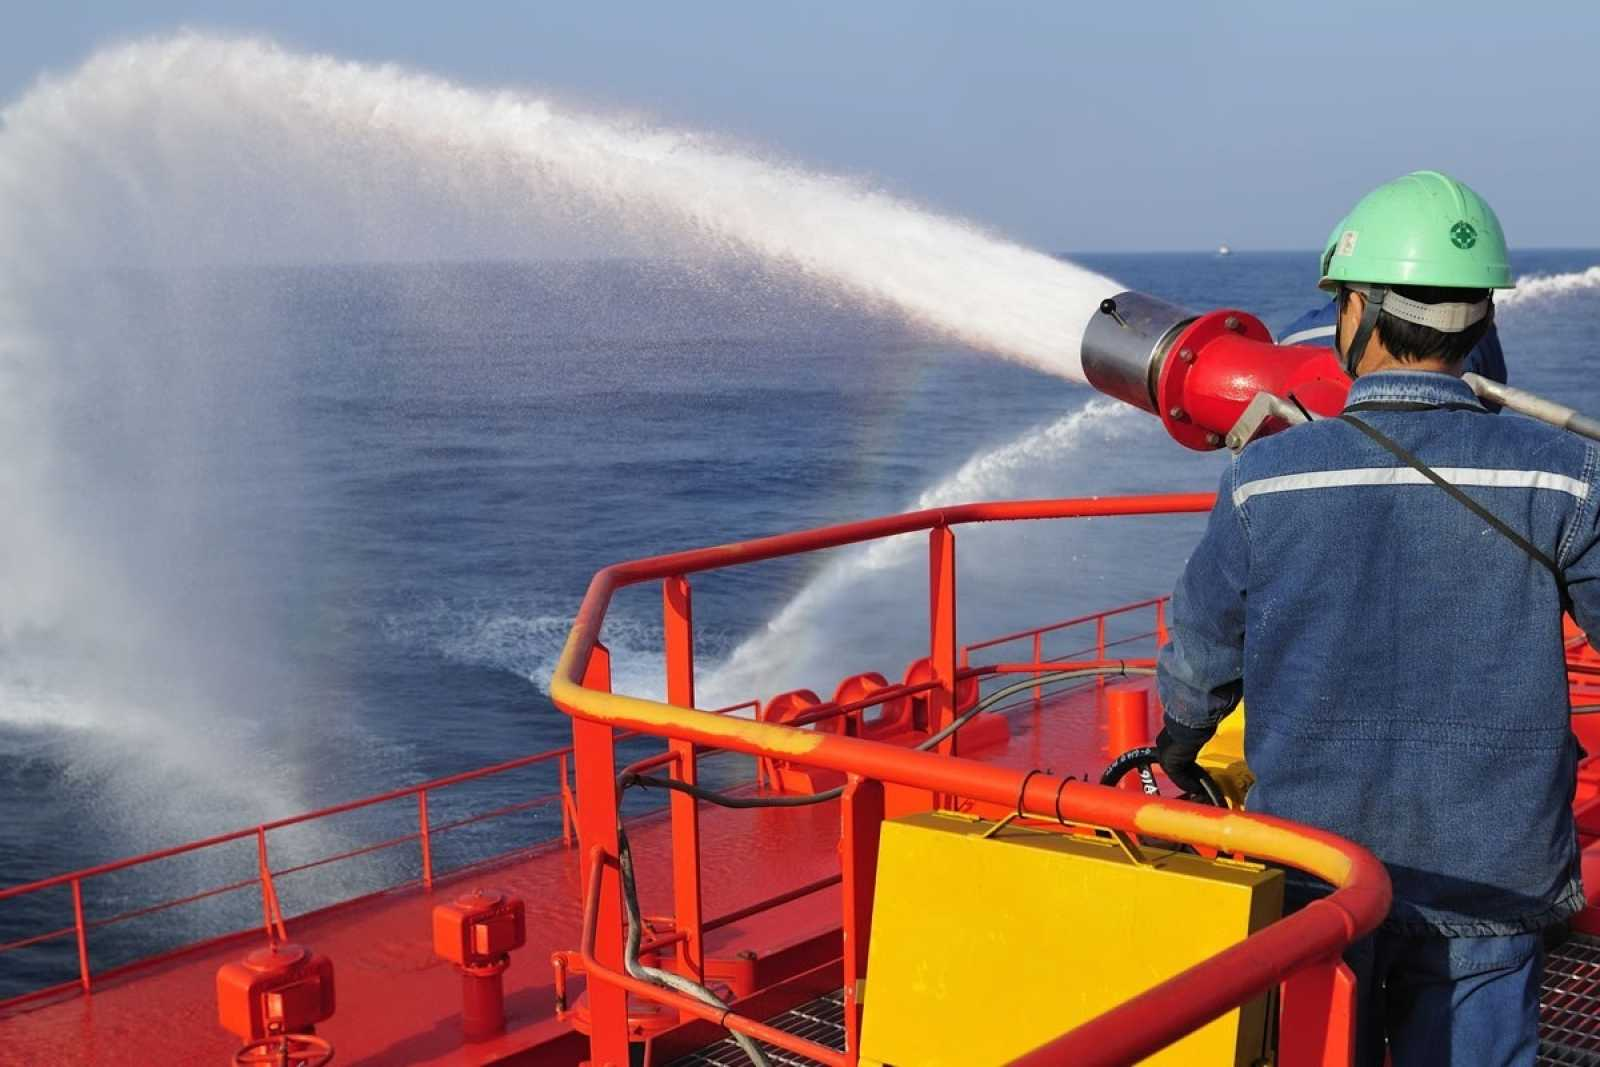 Ship fire hose 75nayp6yy